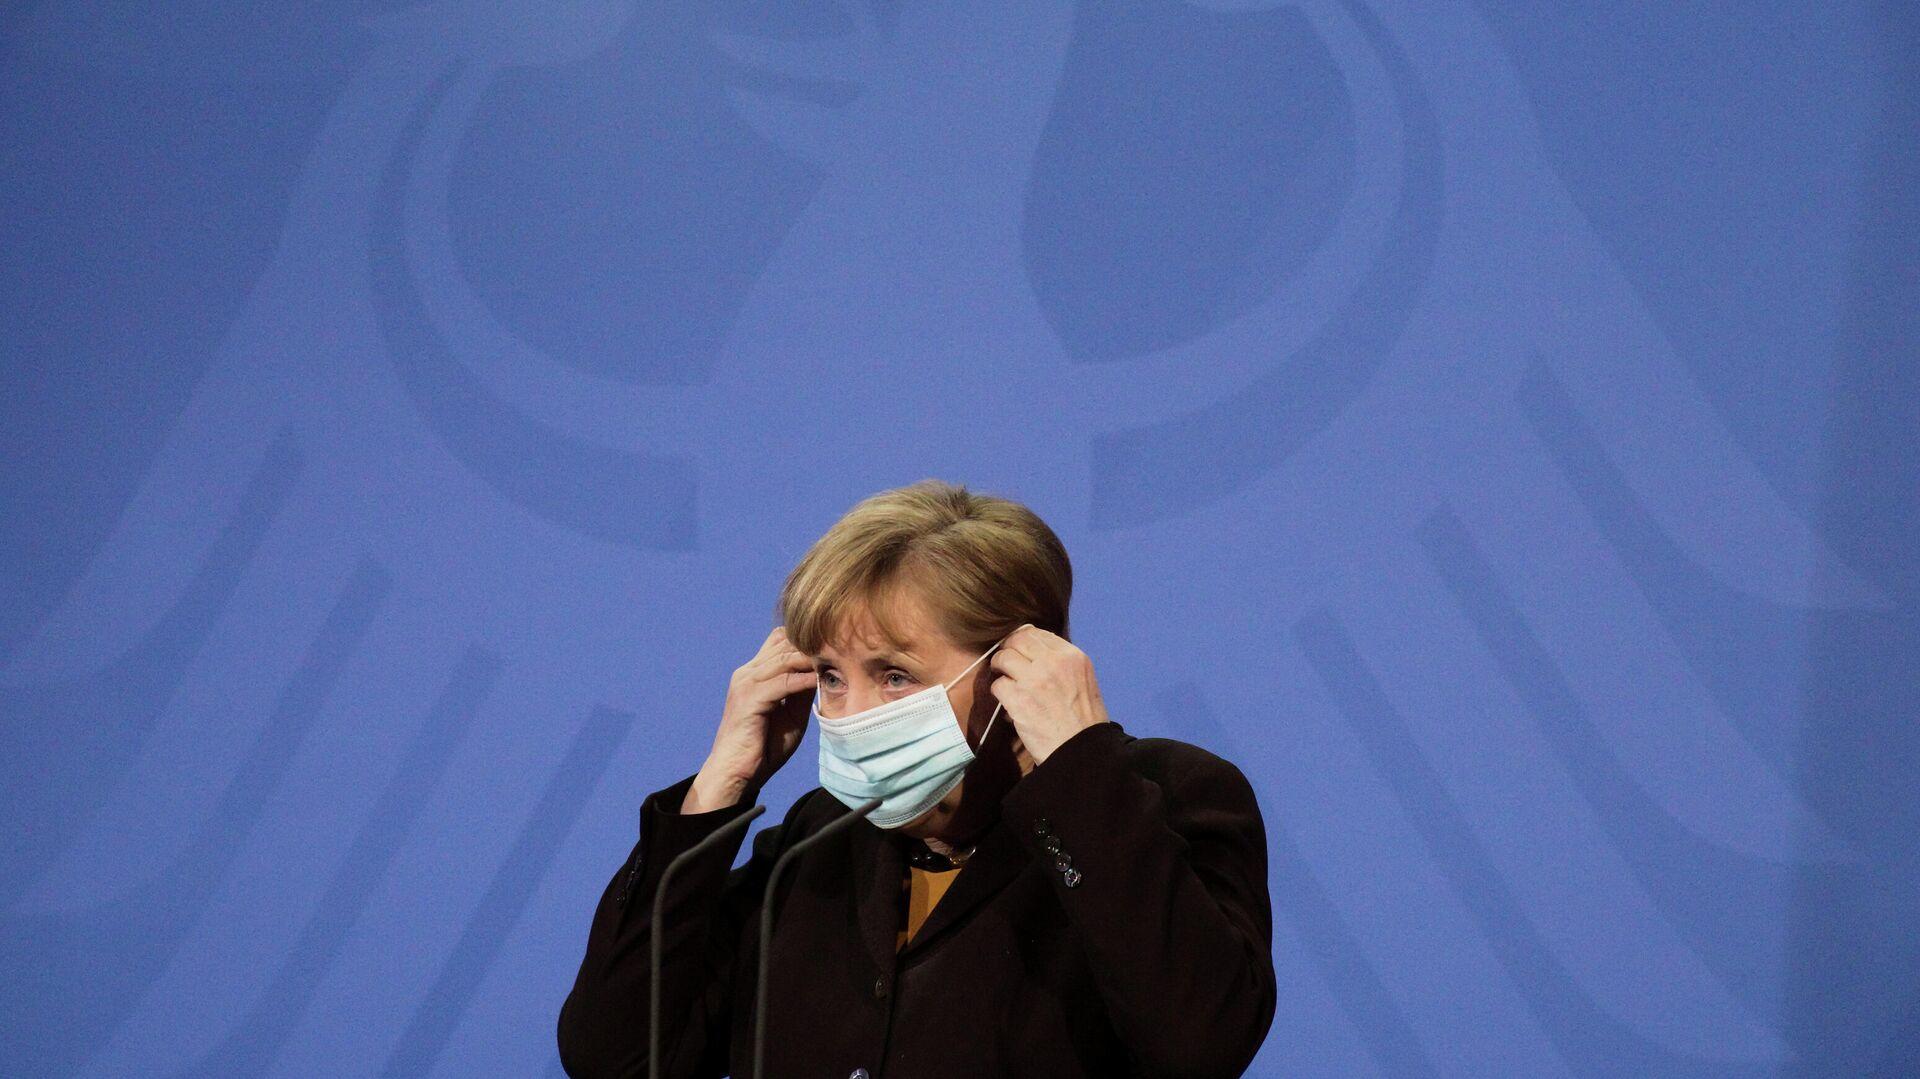 Angela Merkel, canciller alemana - Sputnik Mundo, 1920, 12.04.2021